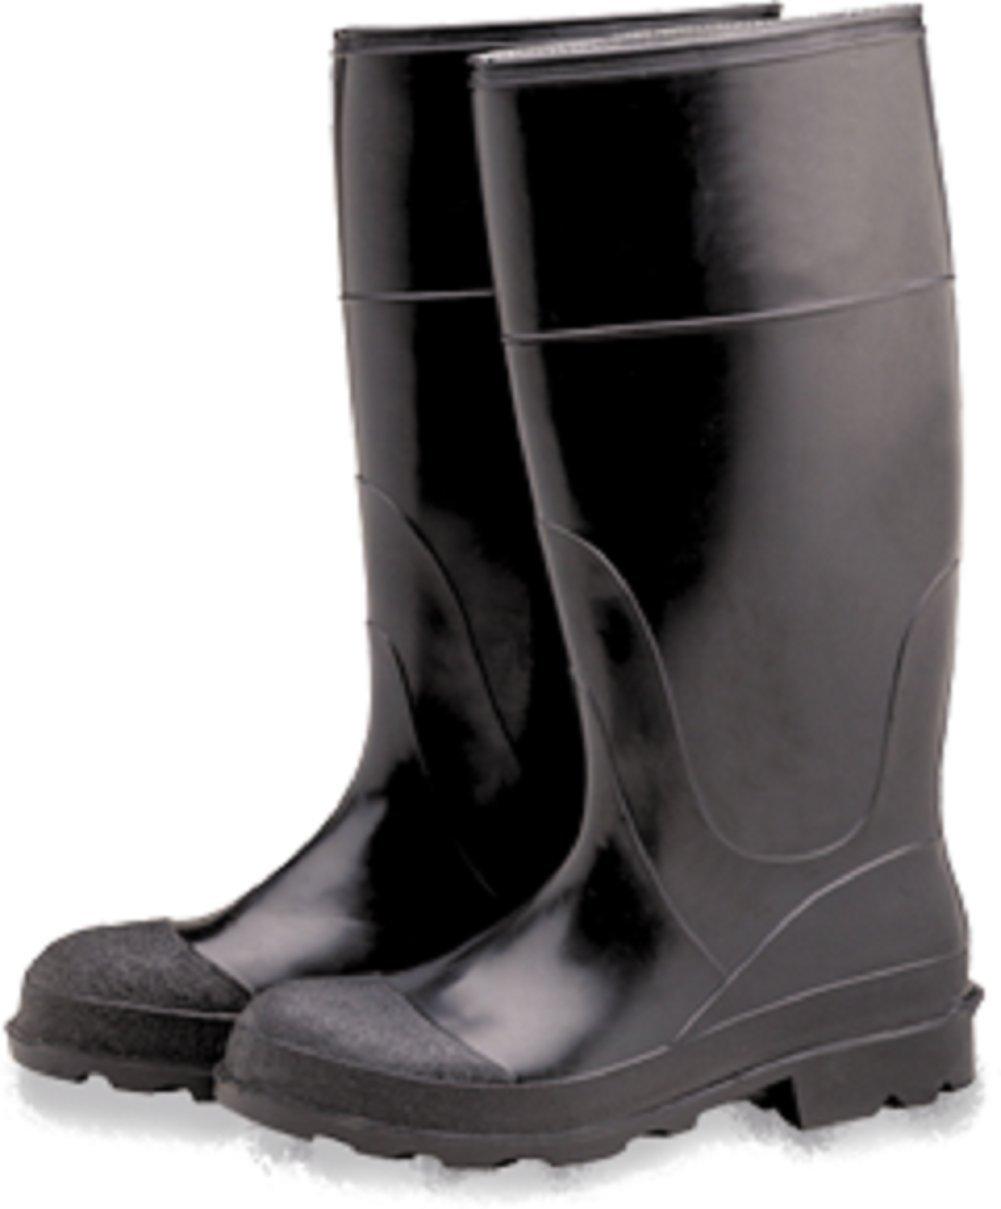 "Industrial PVC Knee Rubber Boots, Plain Toe 16"", Size 7"